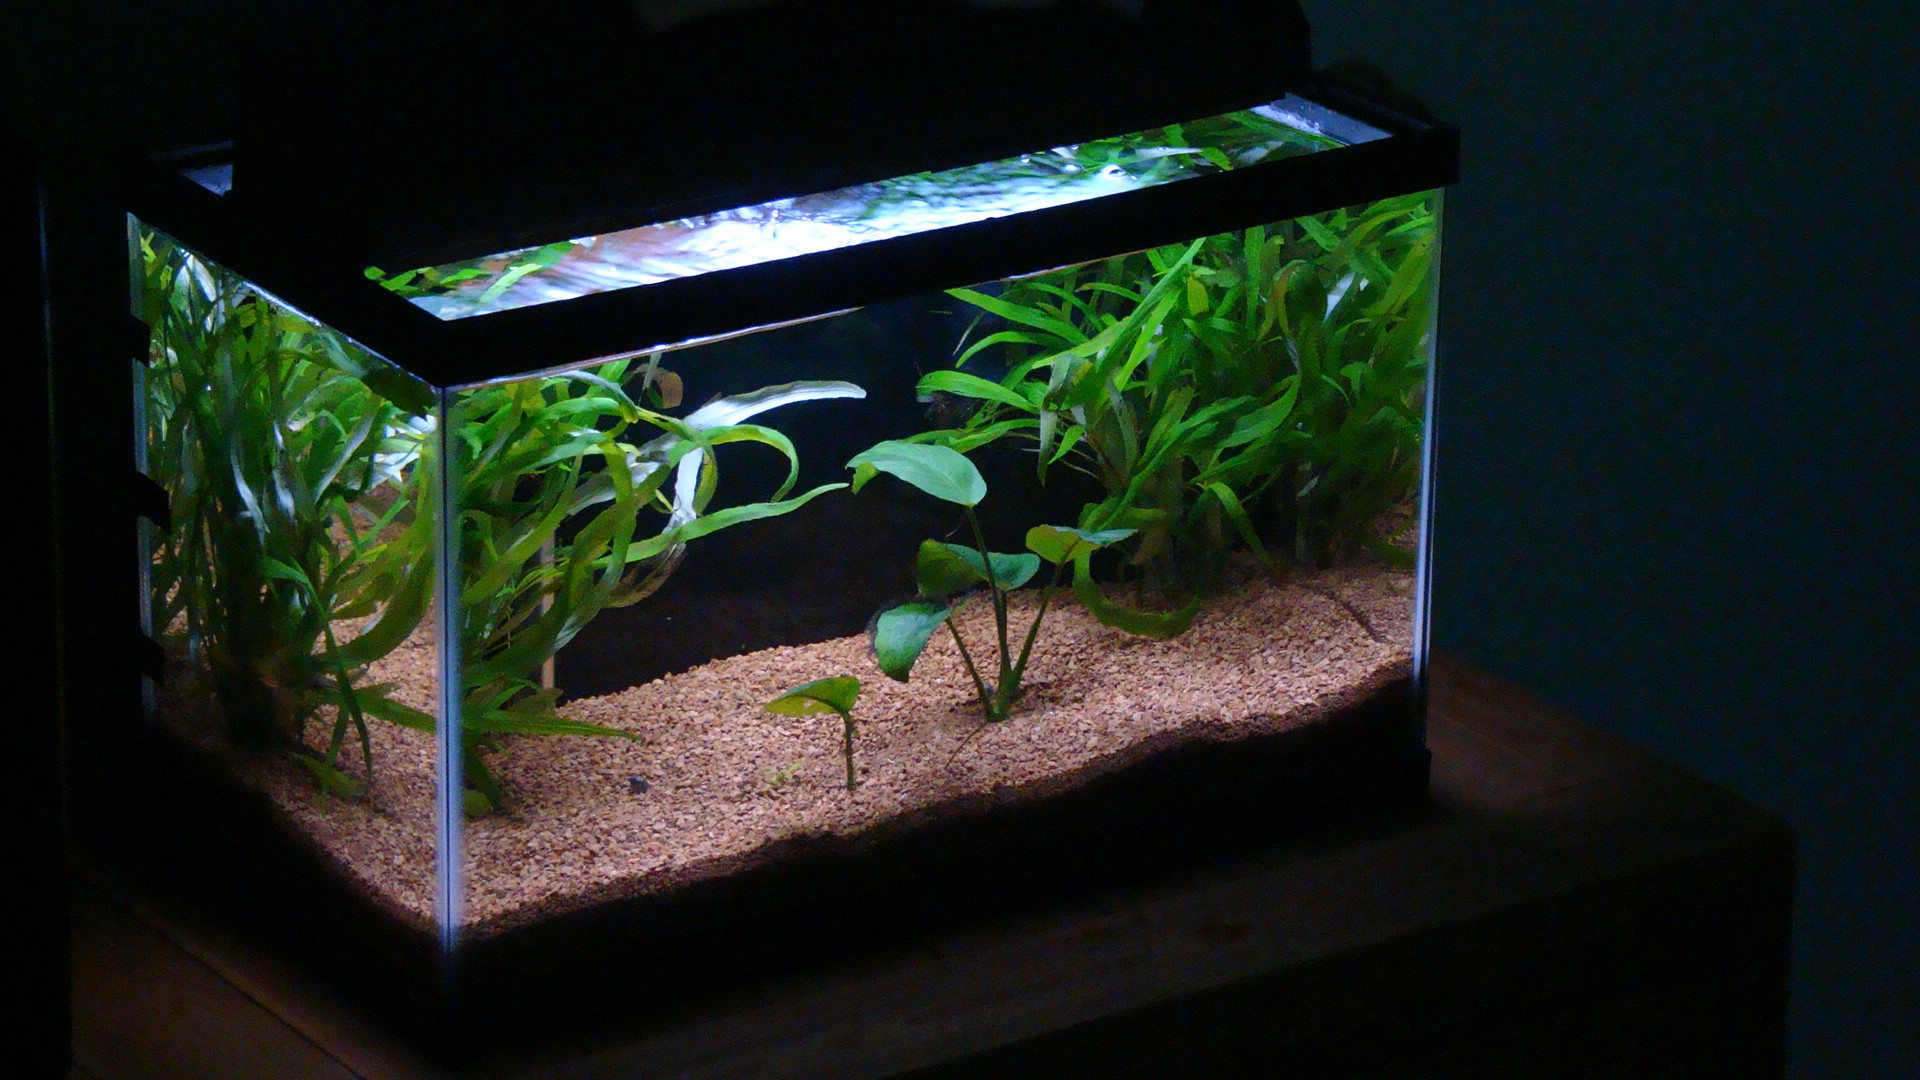 10g planted red cherry shrimp tank. Black Bedroom Furniture Sets. Home Design Ideas